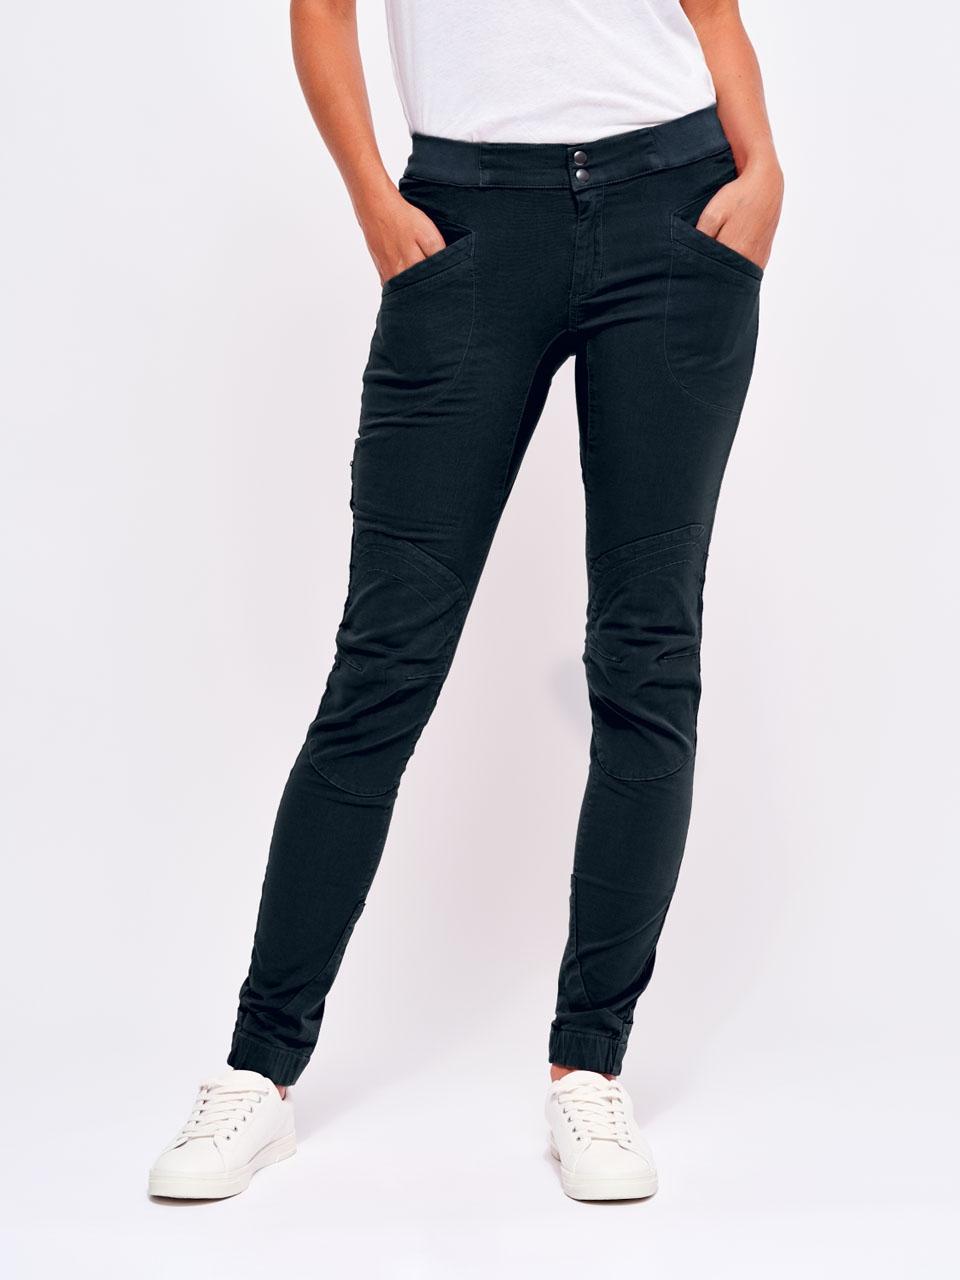 Bleu Marine Pantalon Laila Peak Femme M LOOKING FOR WILD